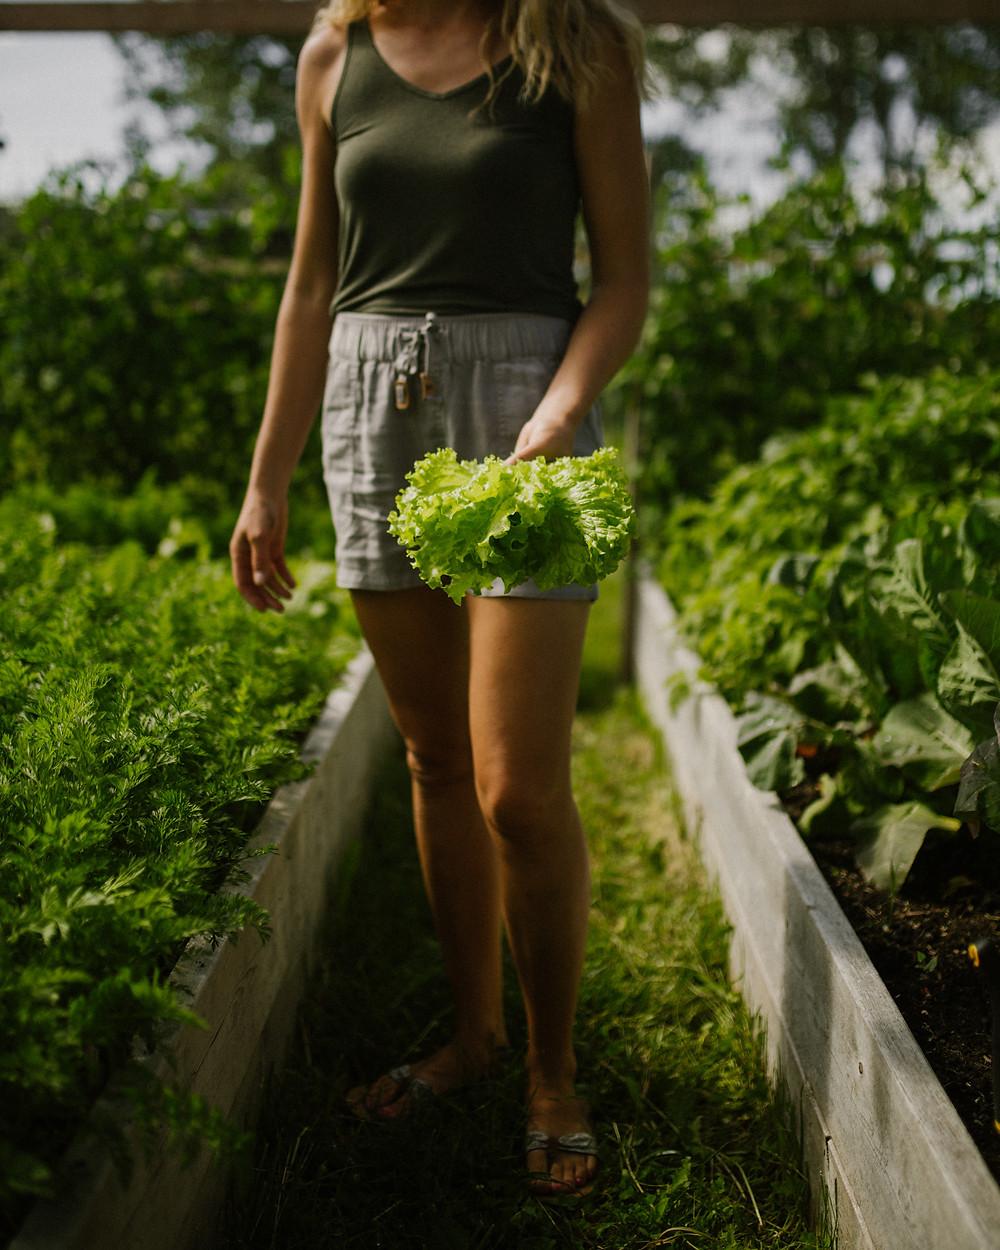 A girl in her backyard raised bed vegetable garden with garden lettuce growing in the background, holding freshly harvested garden lettuce, grown in gardening zone 3 of Alberta, Canada.